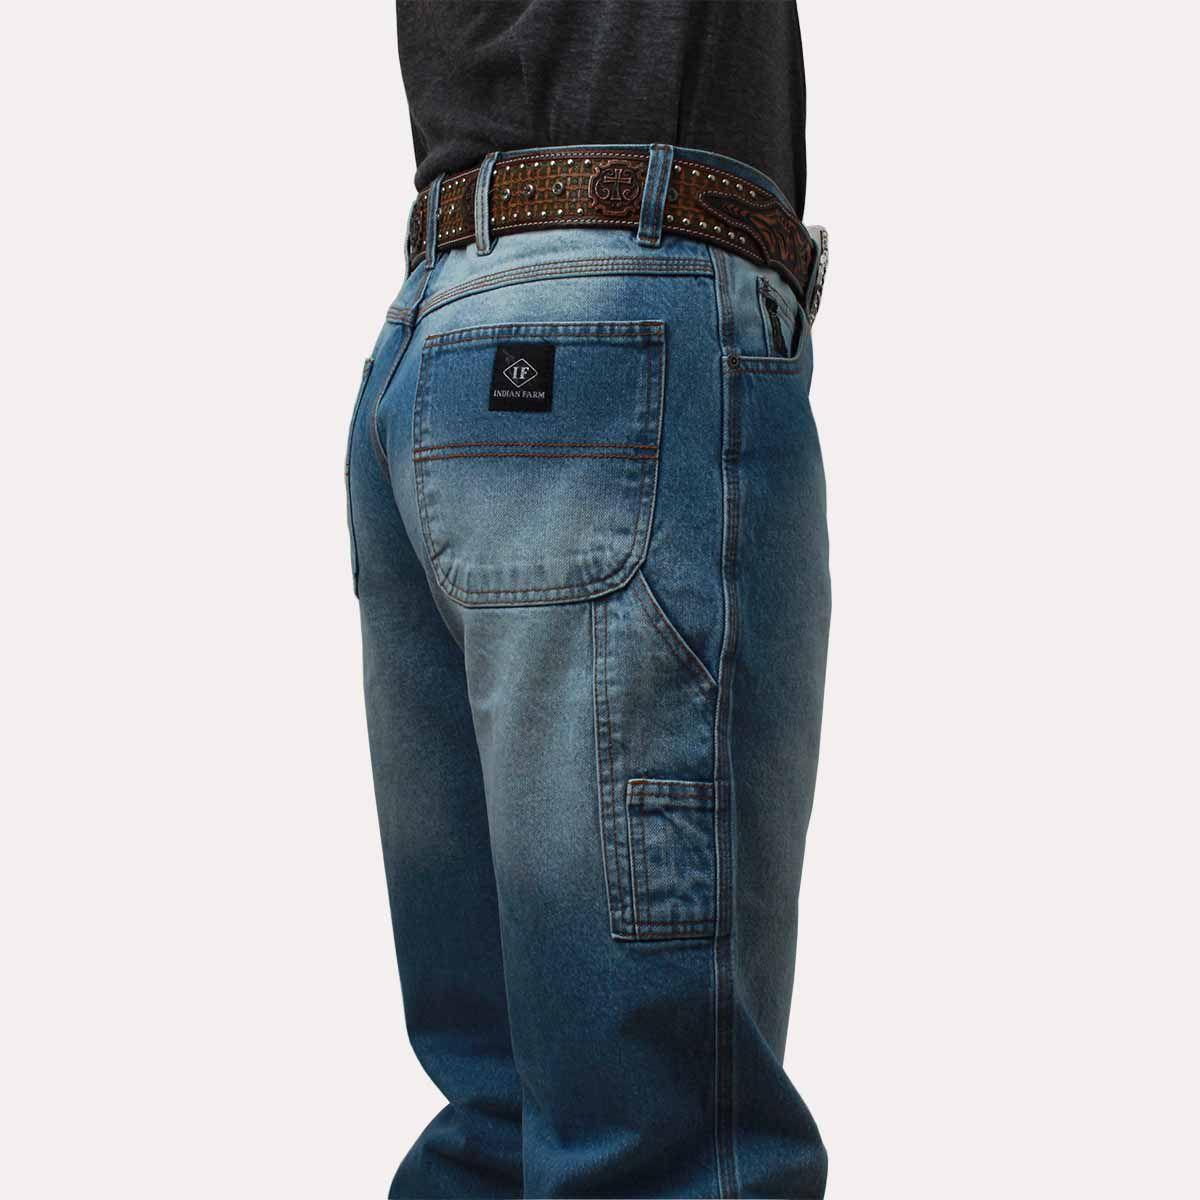 65b0278d45a8b Calça Jeans Indian Farm Masculina Black Ice - Arena Country Echaporã